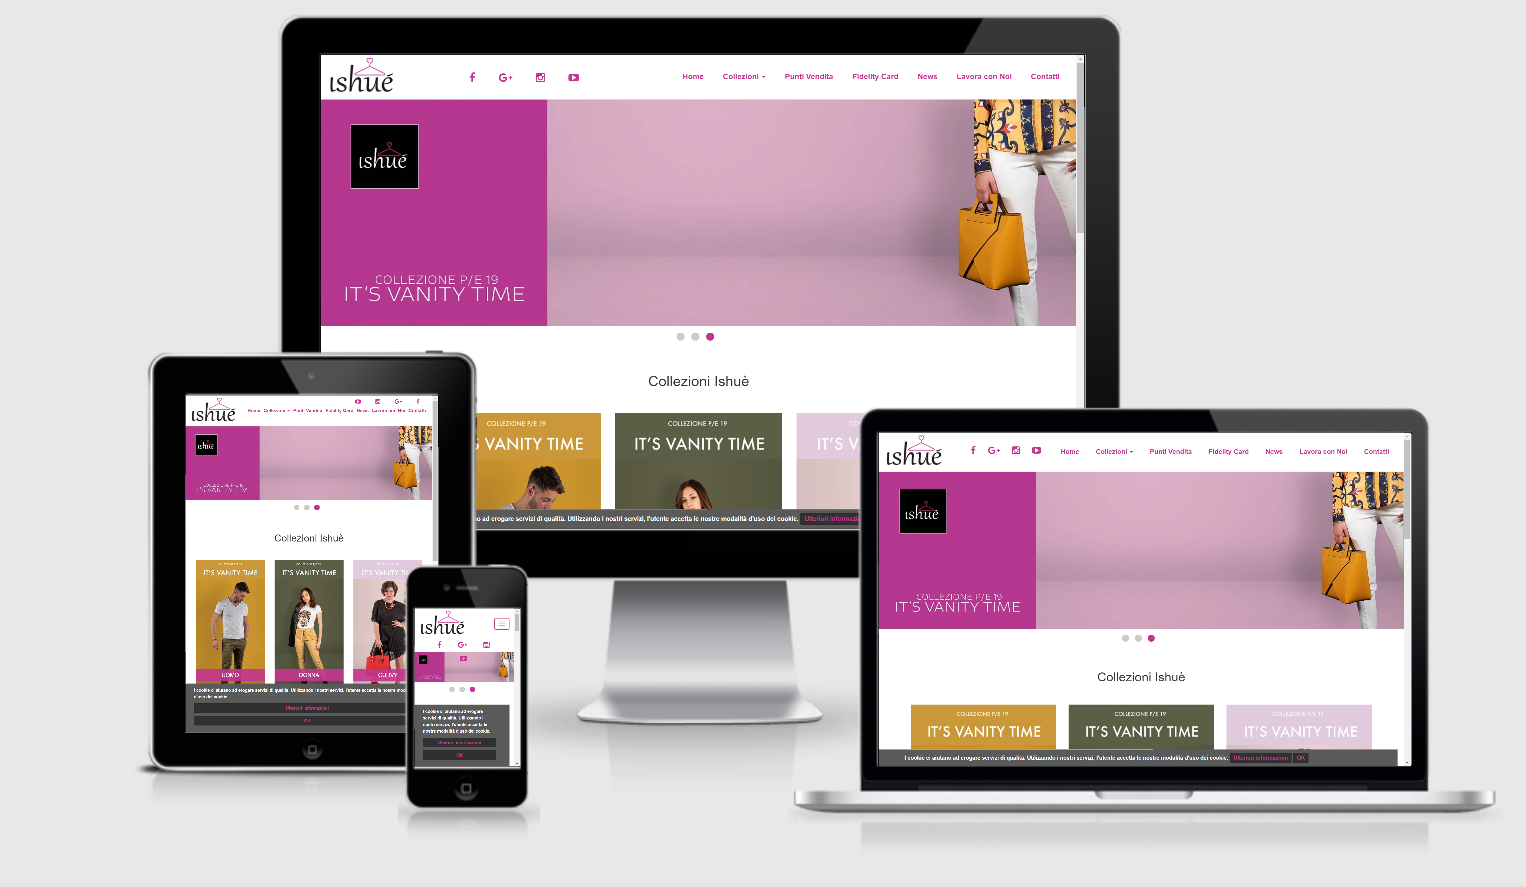 ishue website - creazione siti internet - web agency